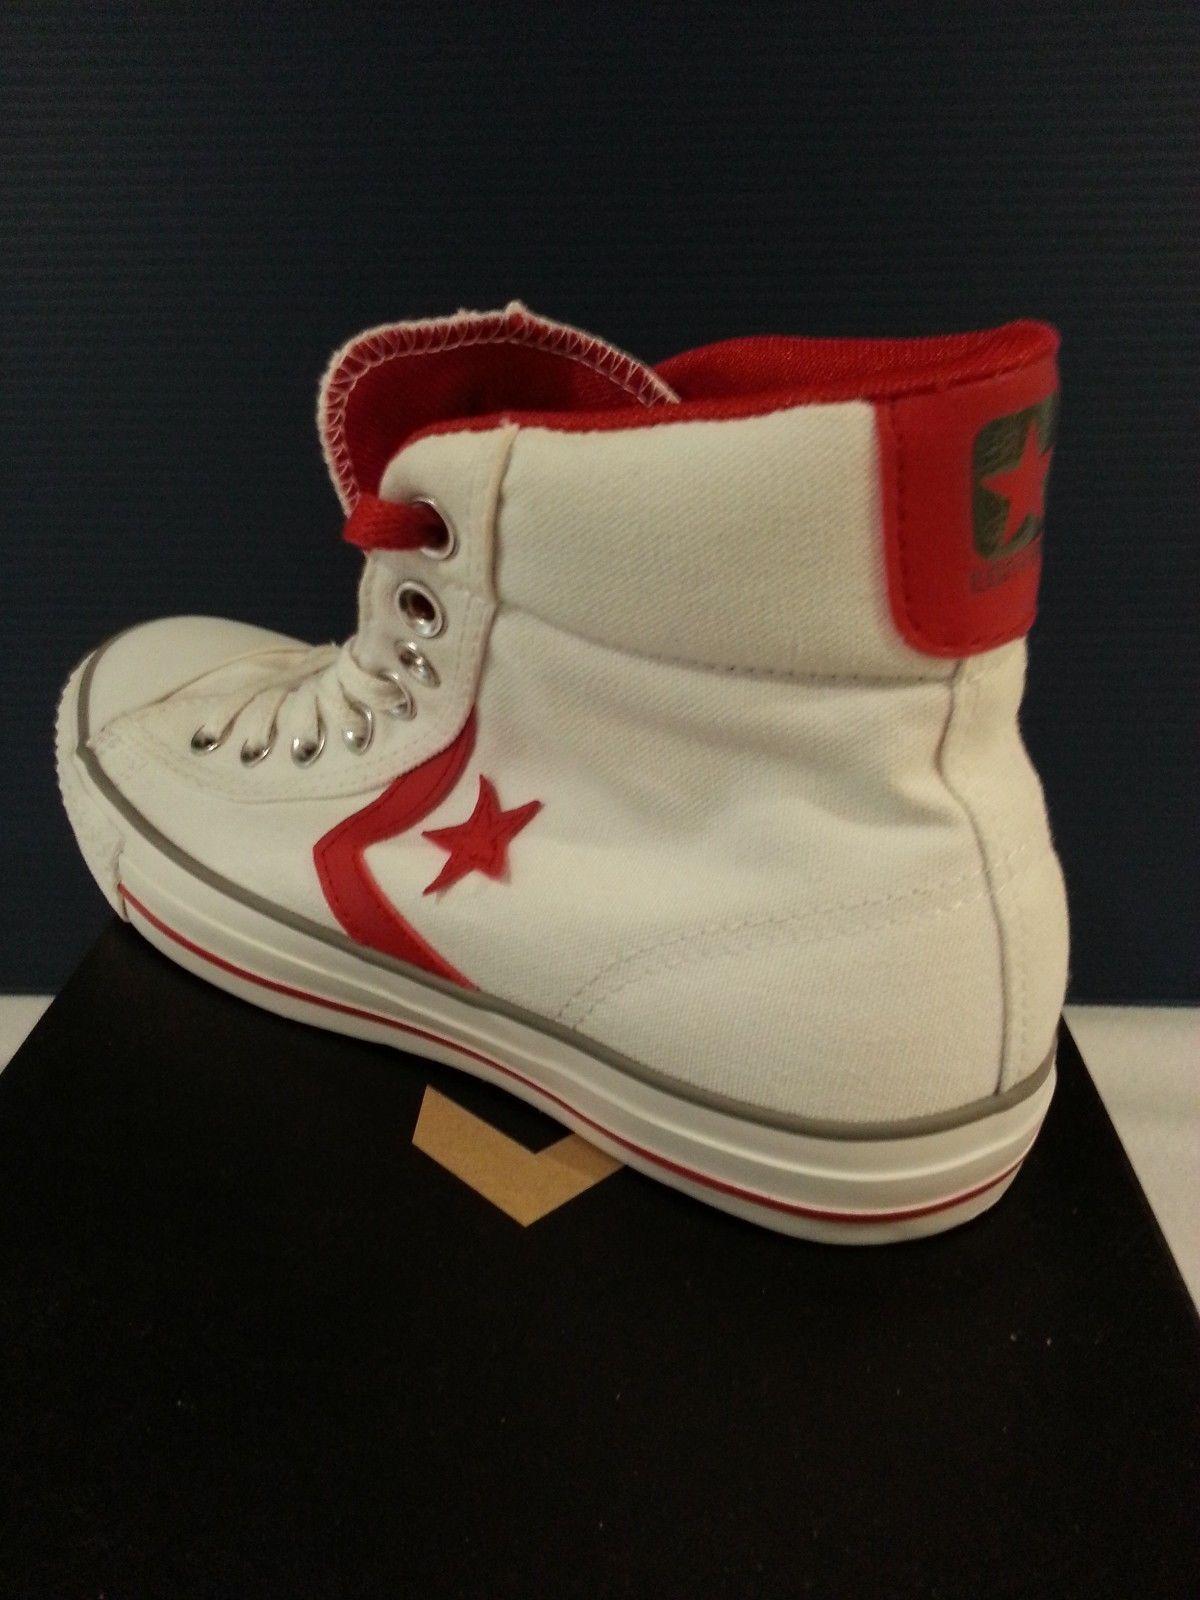 NEW/RARE Converse Star Plyr Ev Mid - White/Red 8 Men's 121436